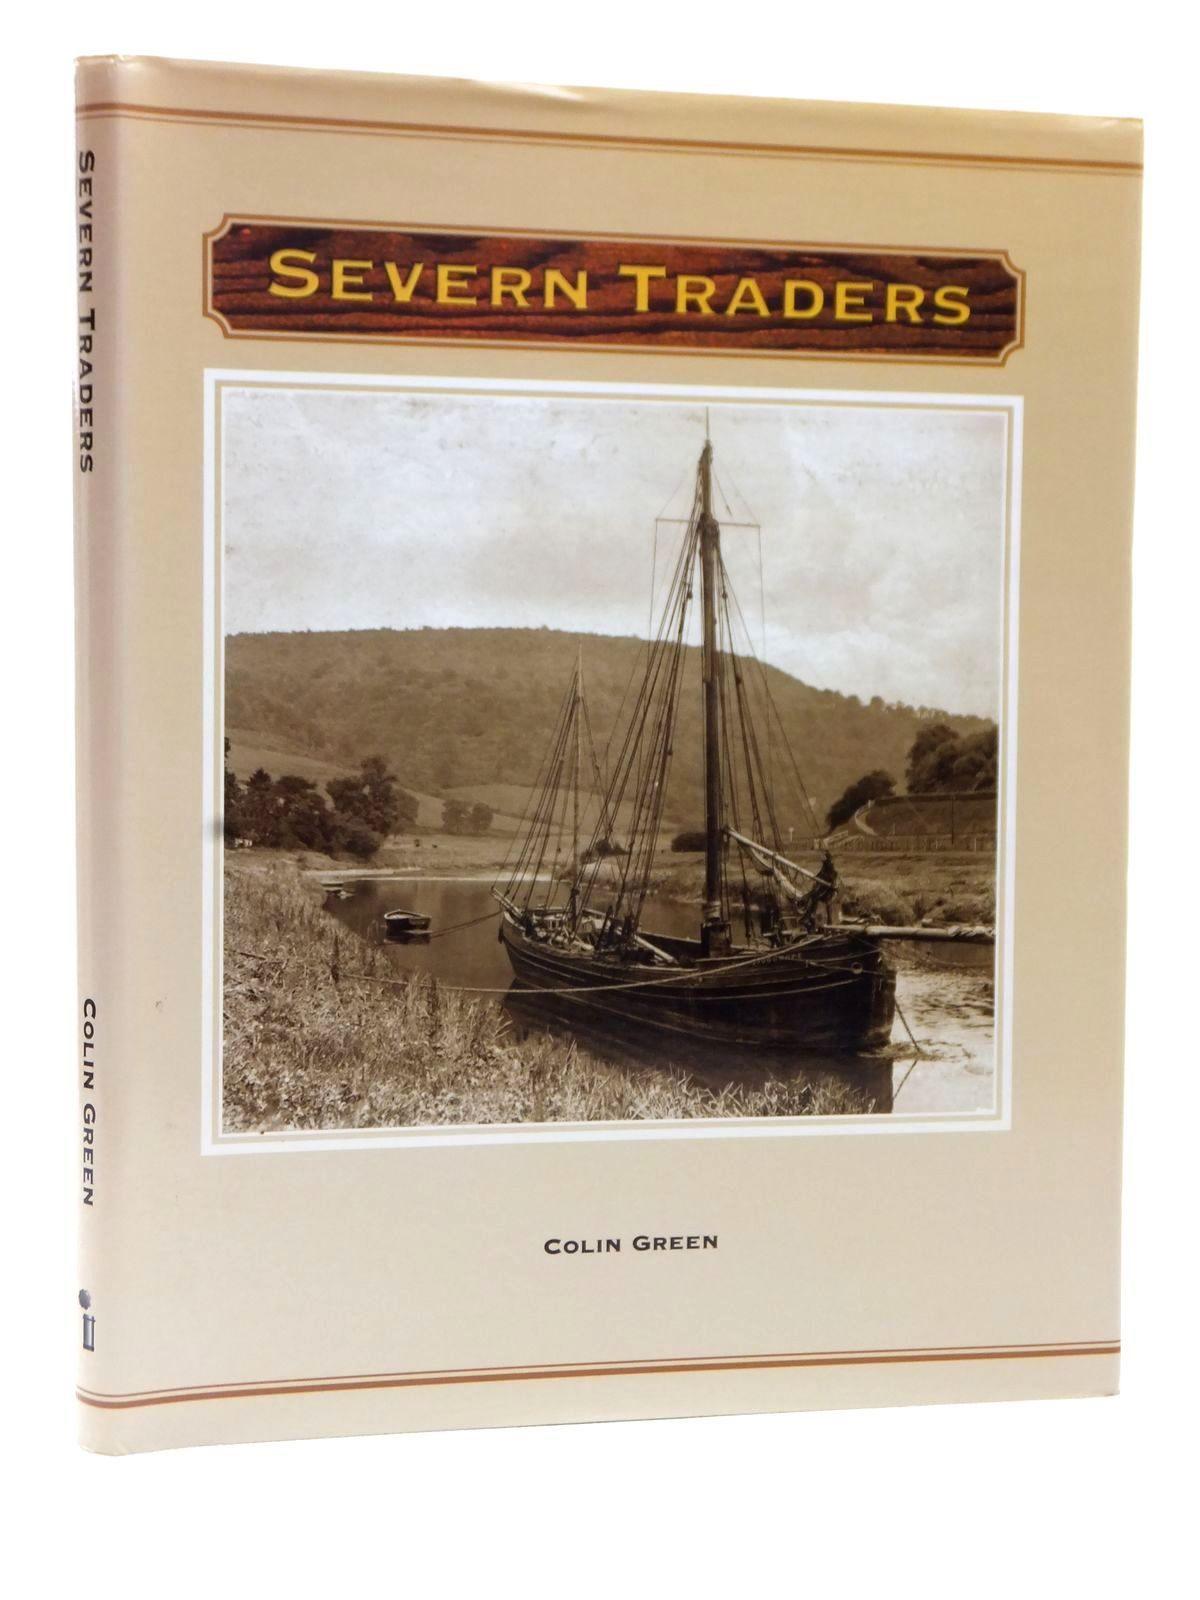 Severn Traders